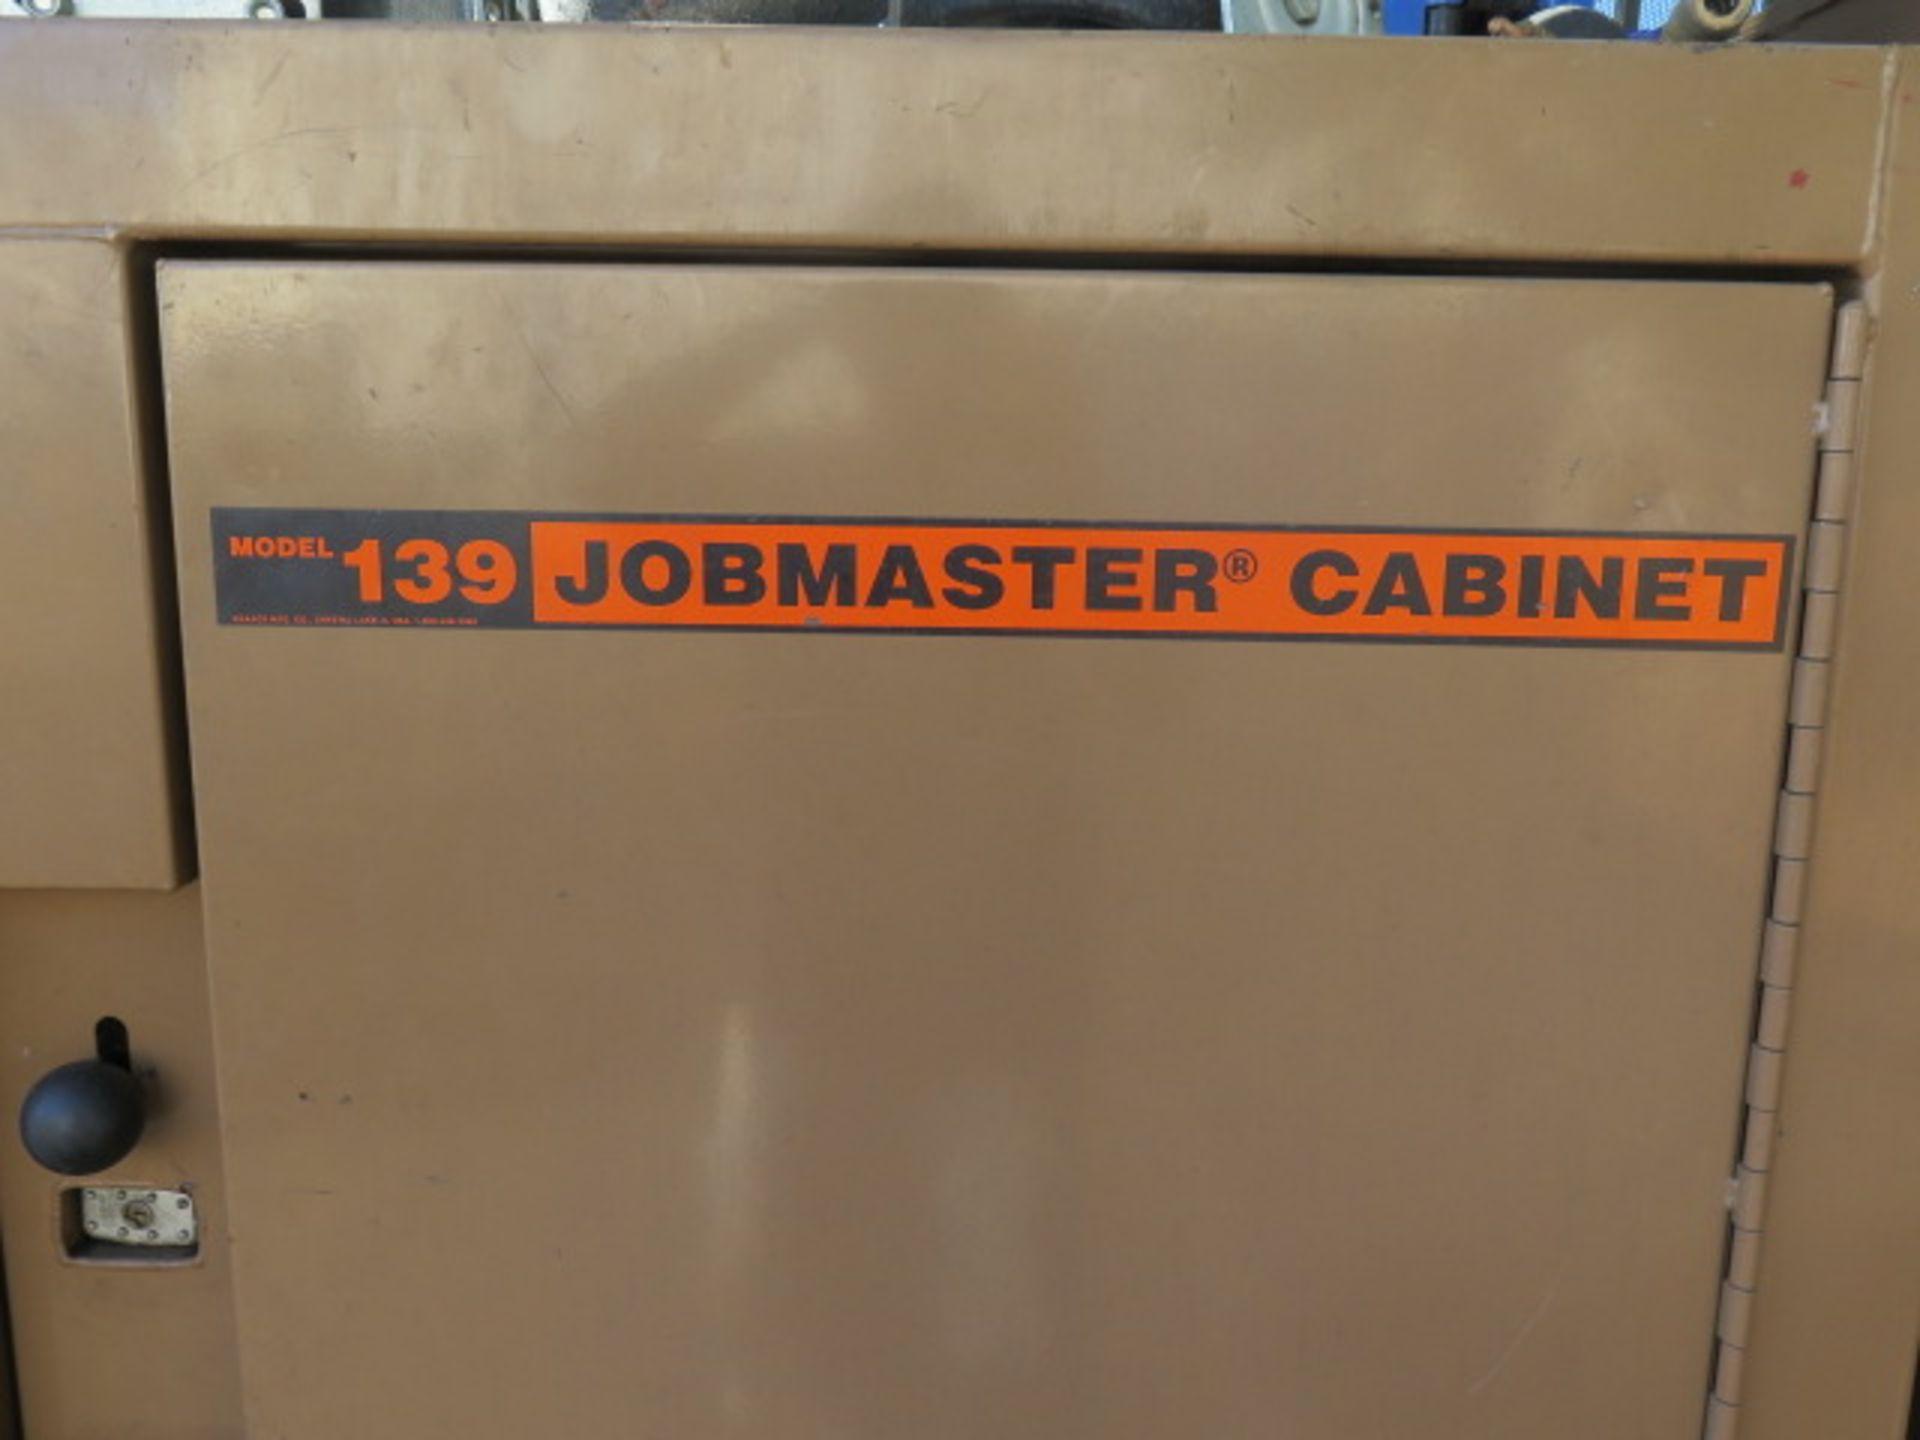 Knaack mdl. 139 Jobmaster Job Box (SOLD AS-IS - NO WARRANTY) - Image 3 of 17